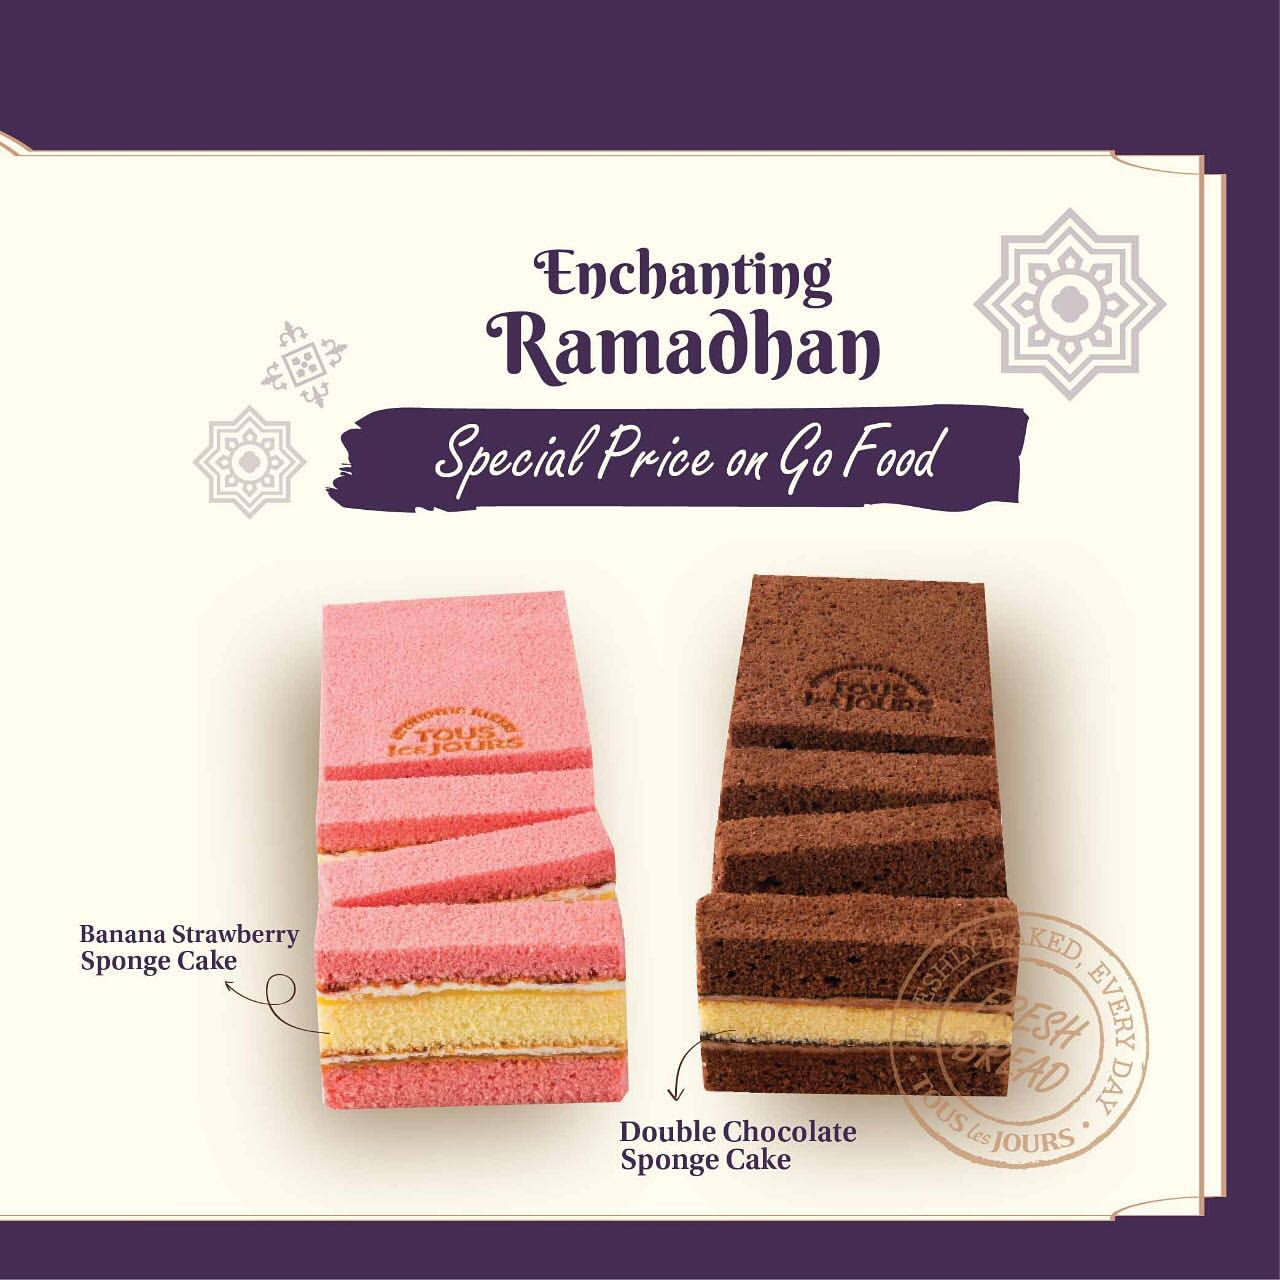 Diskon Tous Les Jours Enchanting Ramadhan Promo Special Price on GoFood